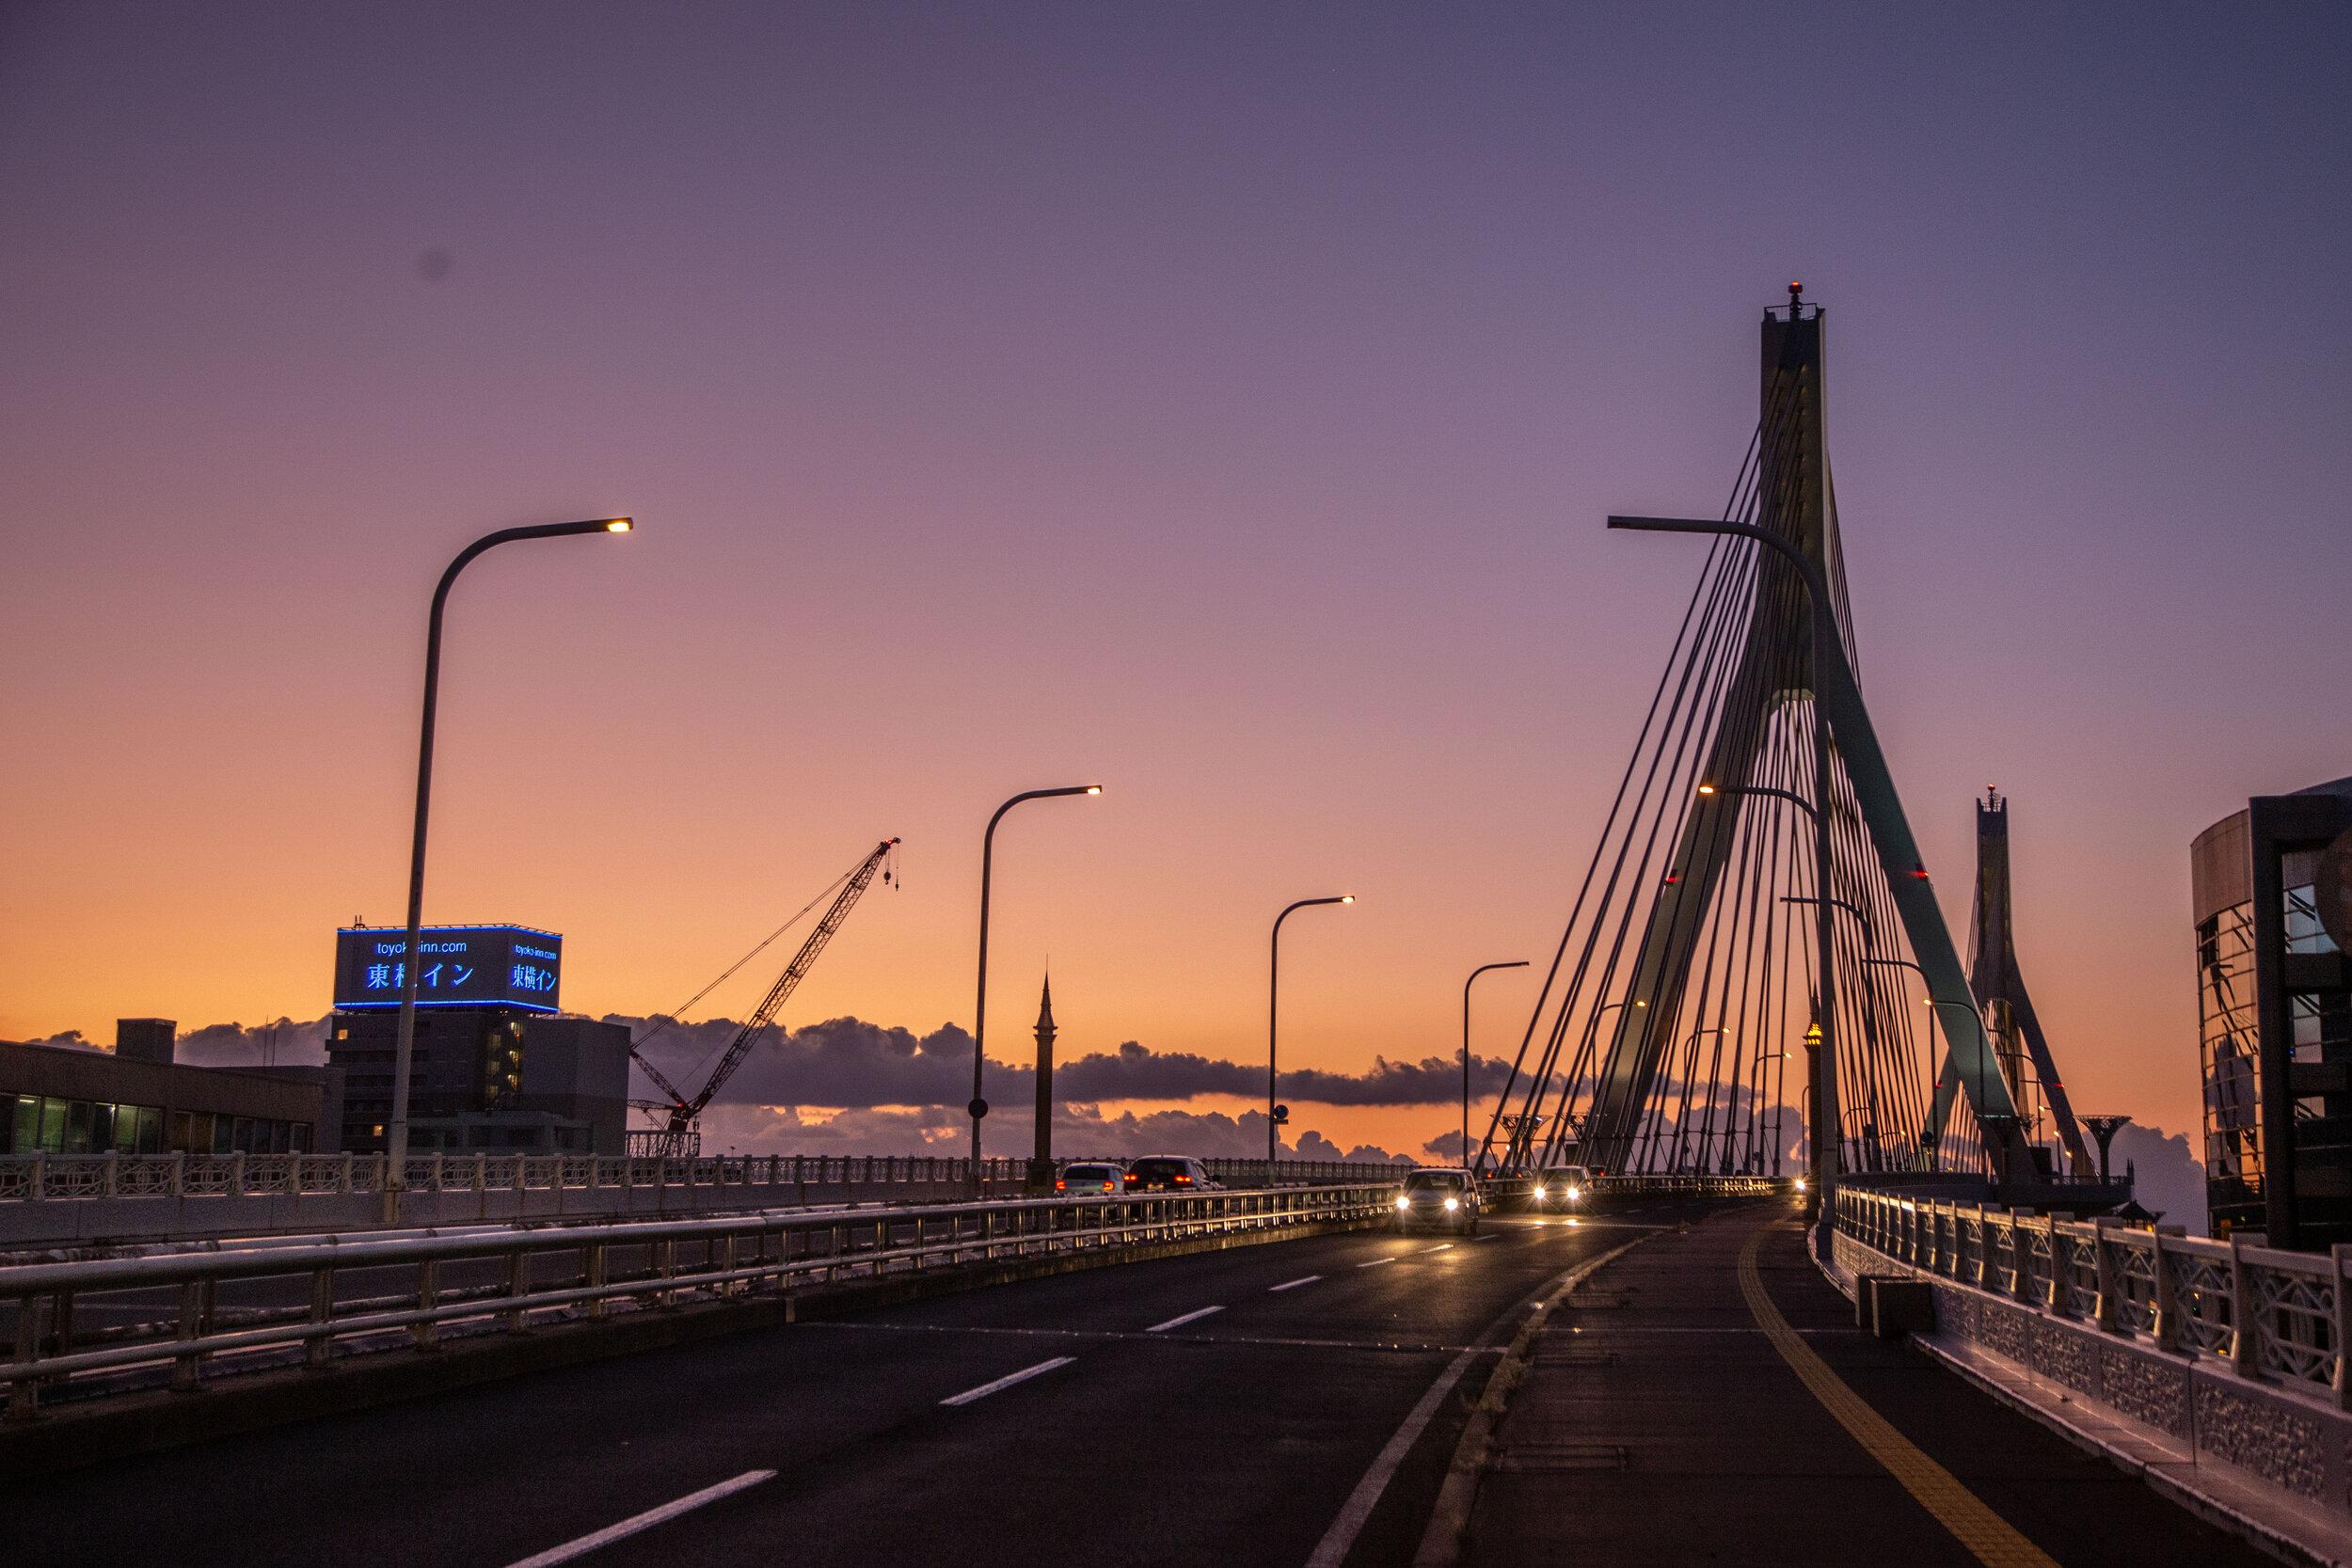 Aomori Bay Bridge 2